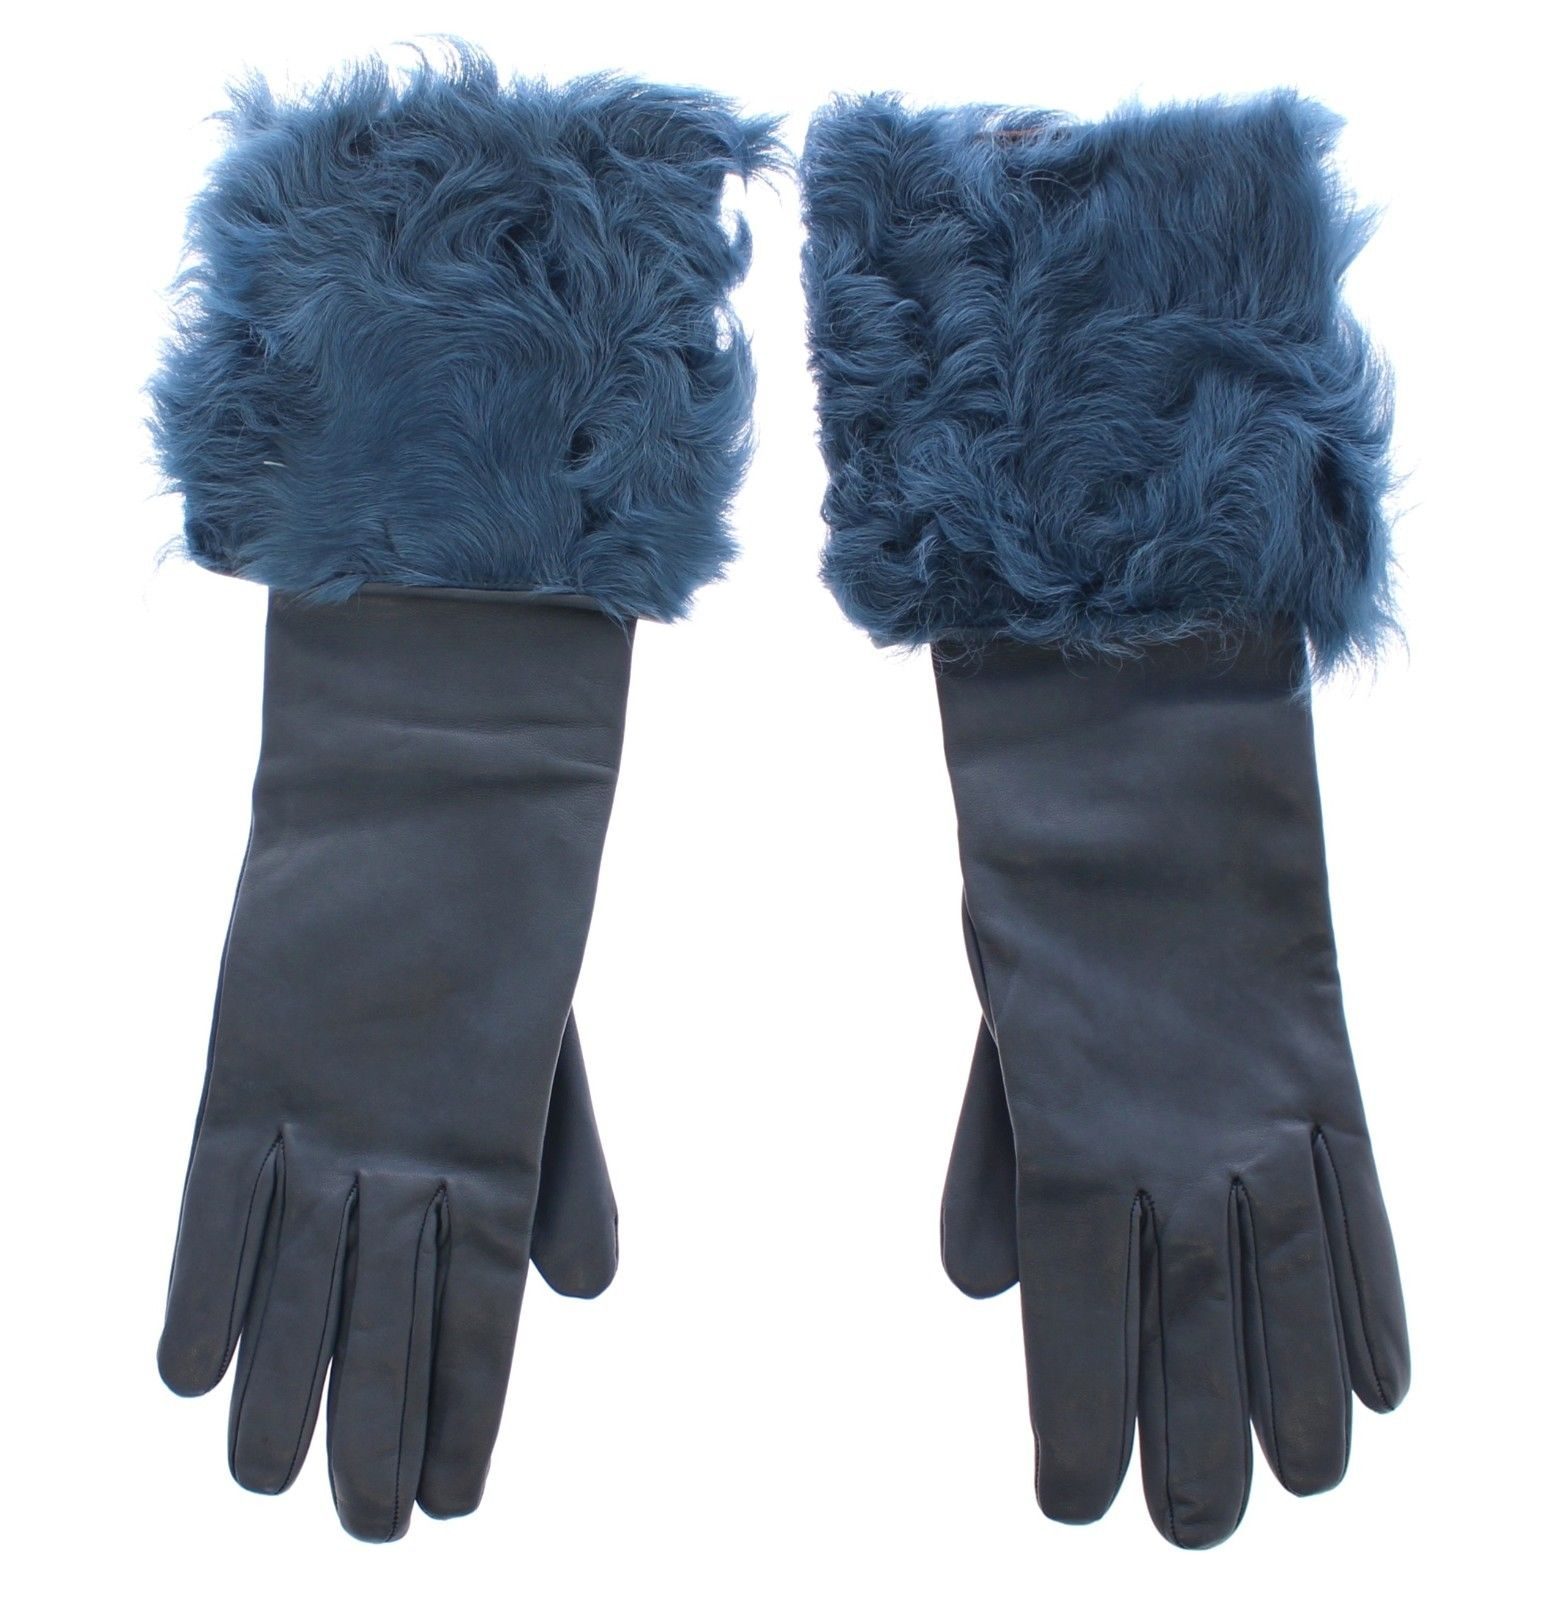 Dolce & Gabbana Women's Lambskin Leather Fur Logo Wrist Gloves Blue MOM11431 - 6.5 | XS